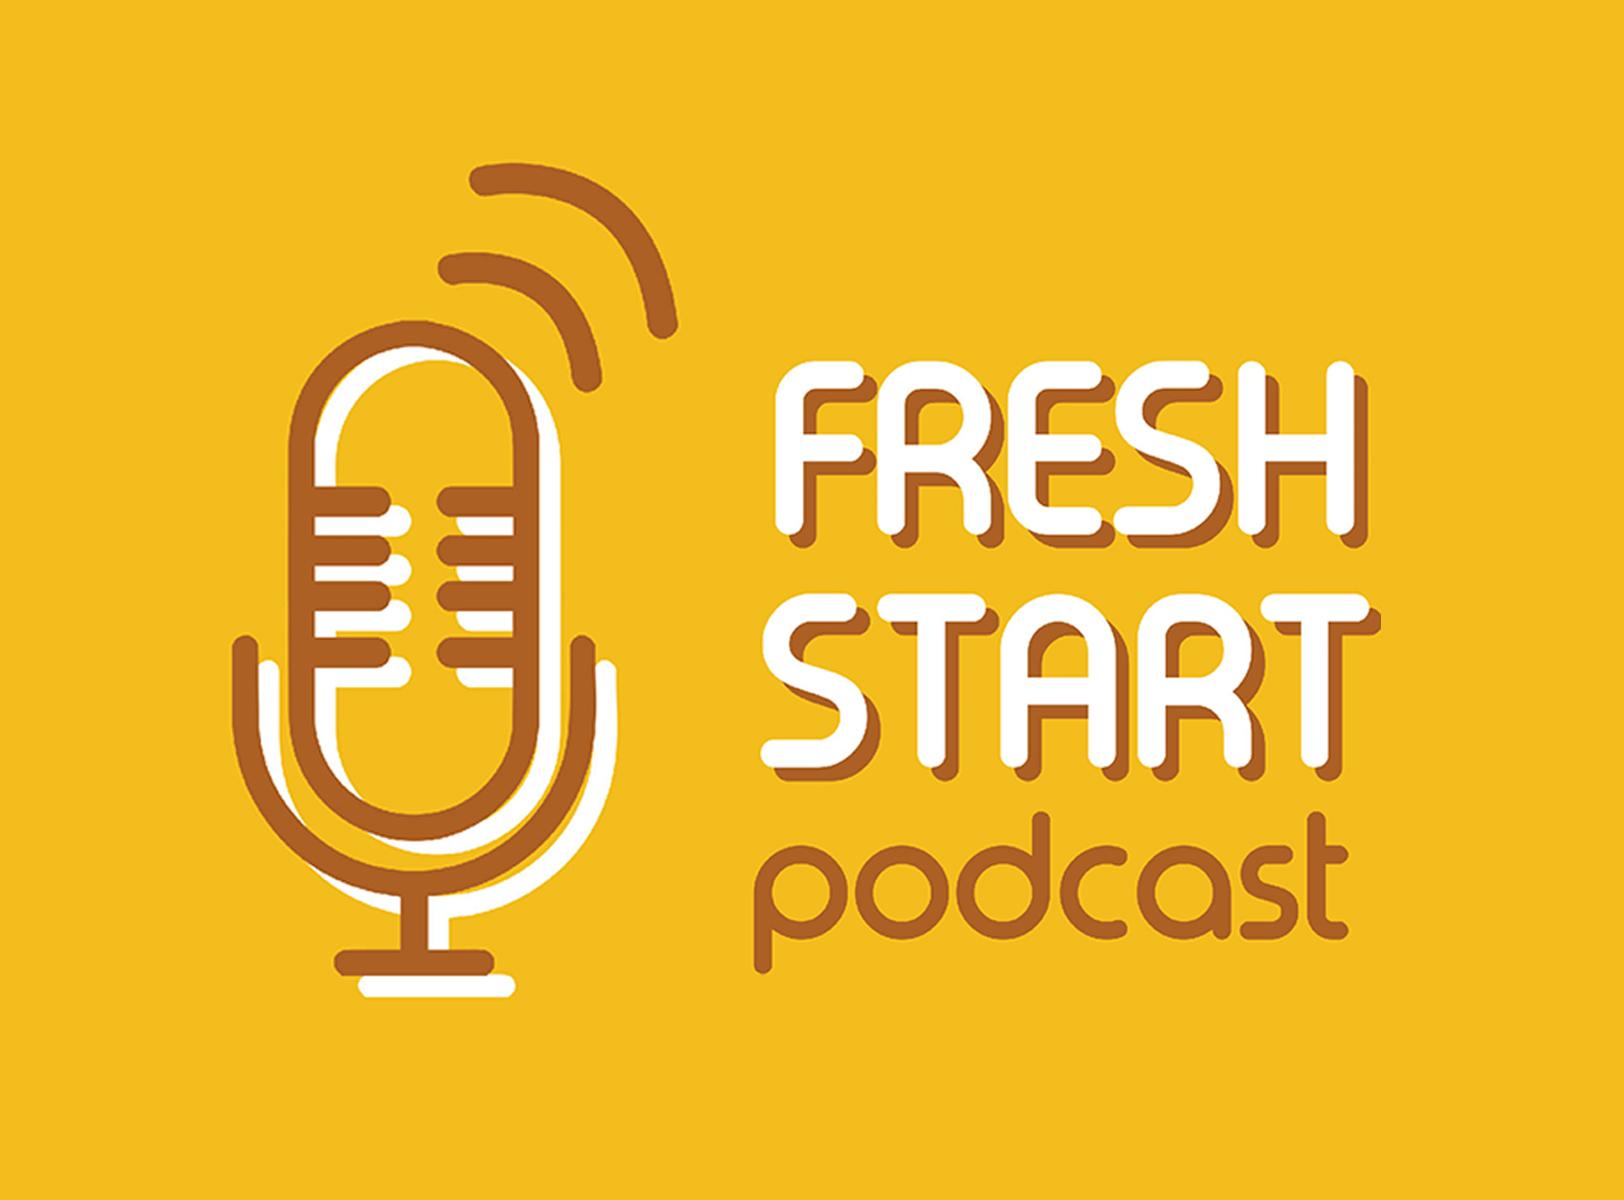 Fresh Start: Podcast News (8/24/2018 Fri.)